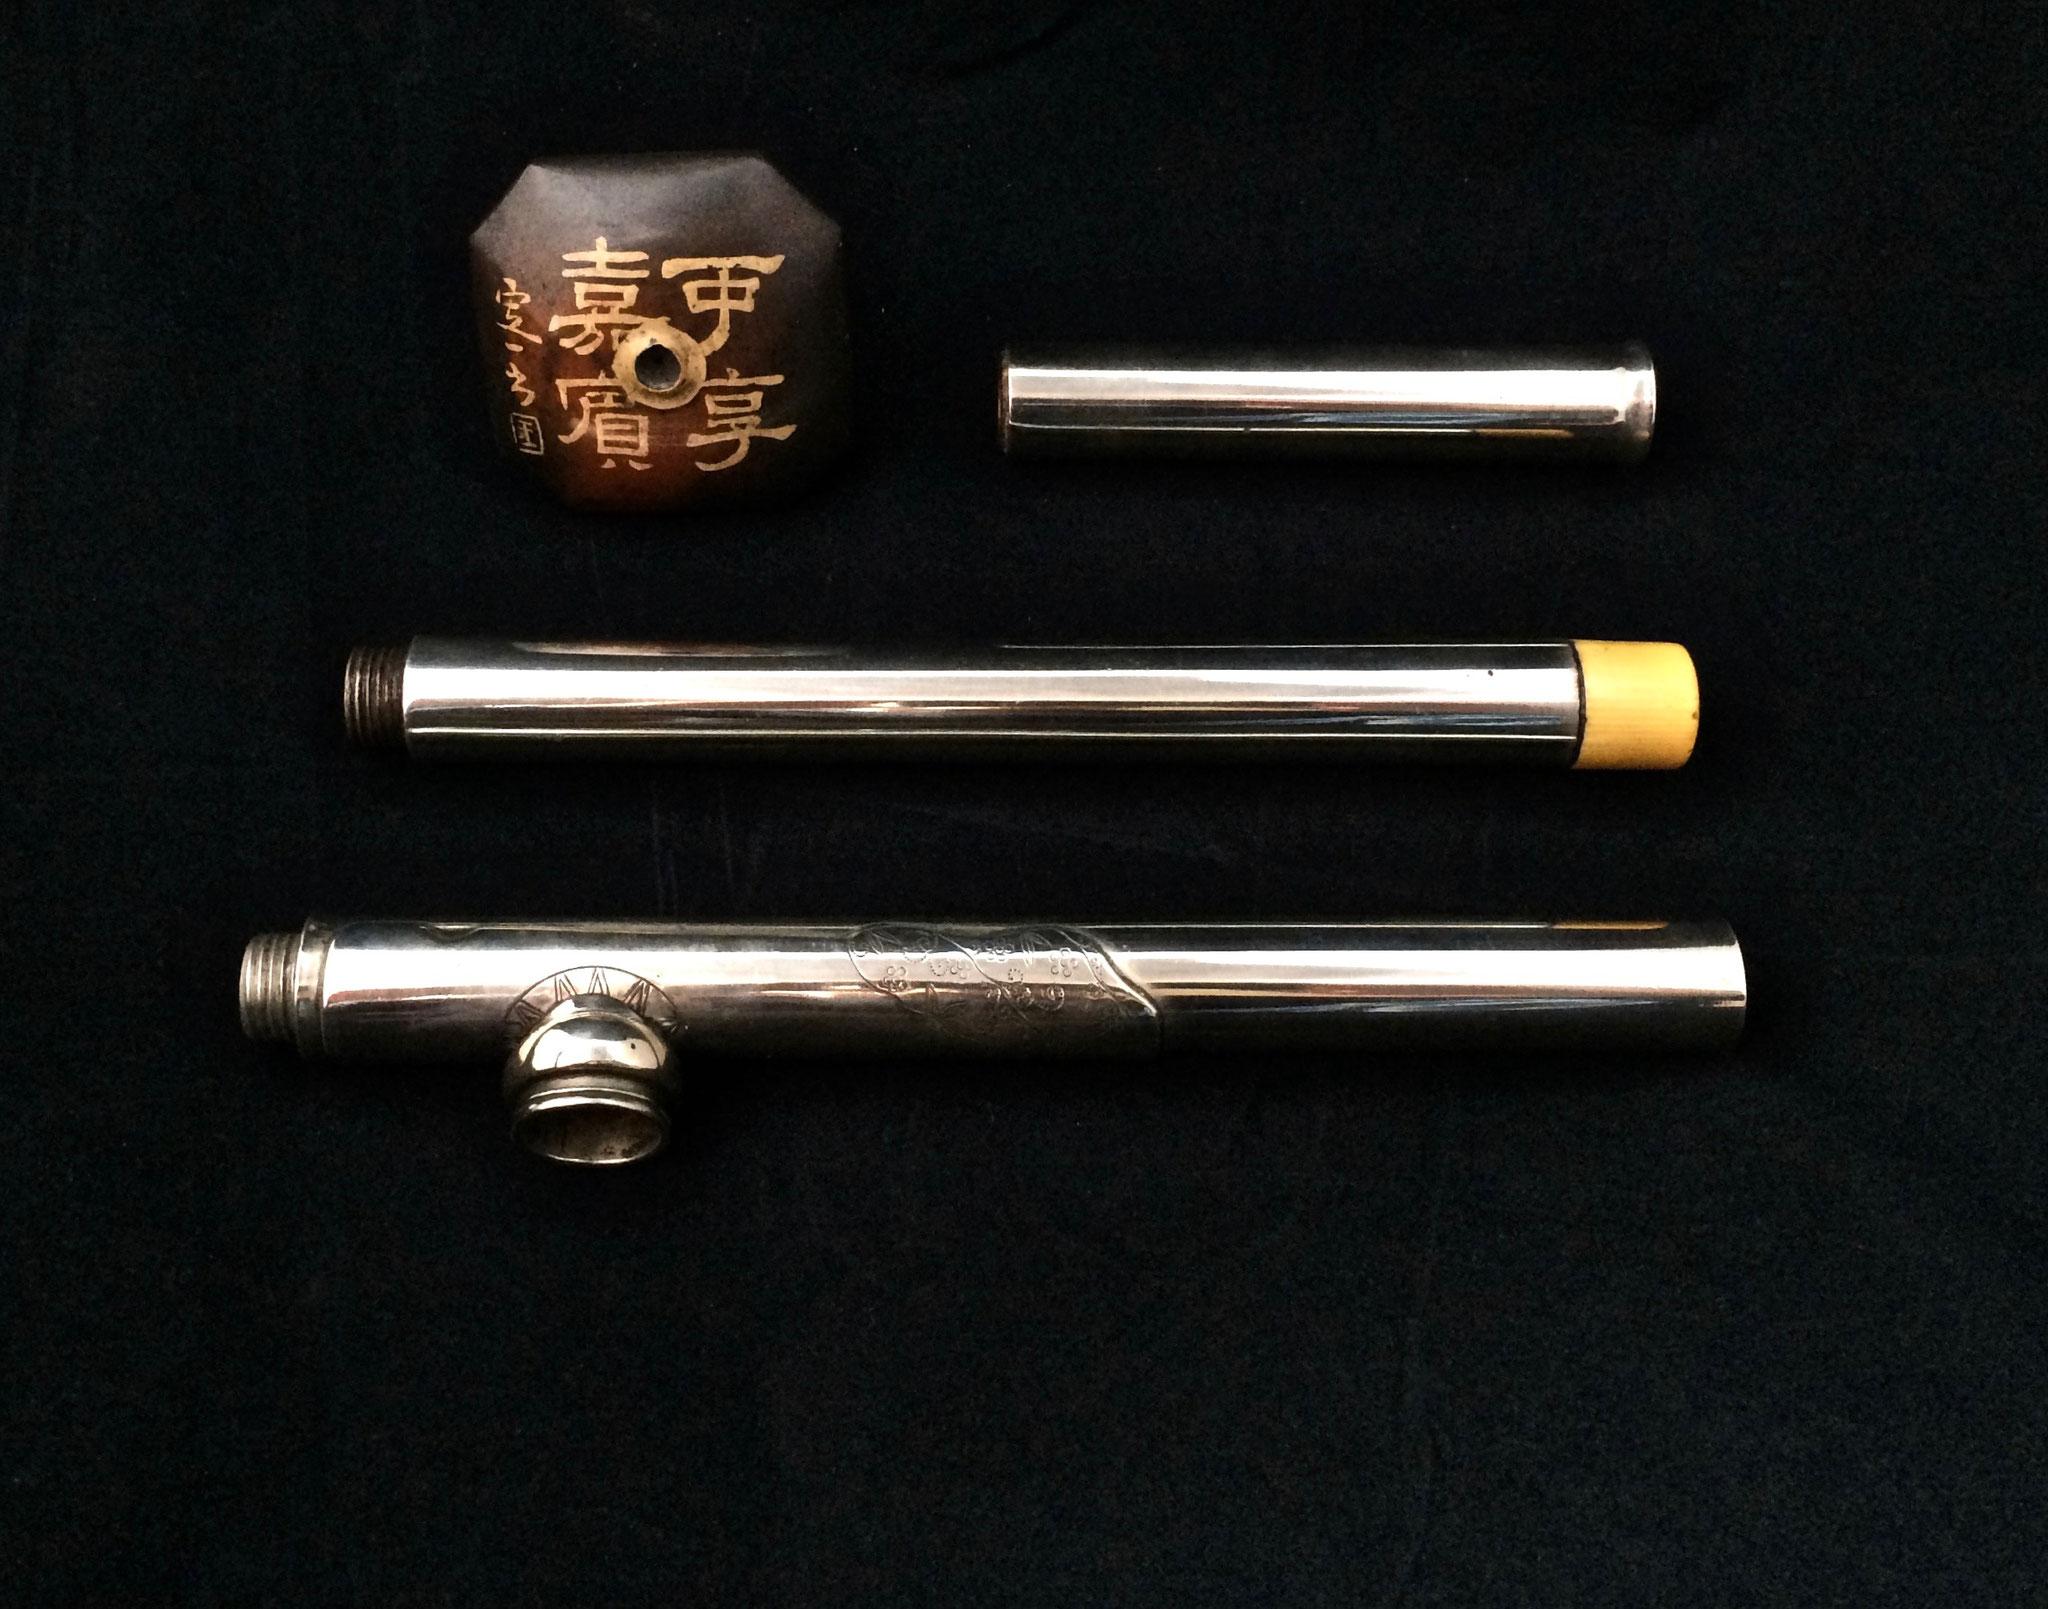 Paktong travel opium pipe (–> Pipes)